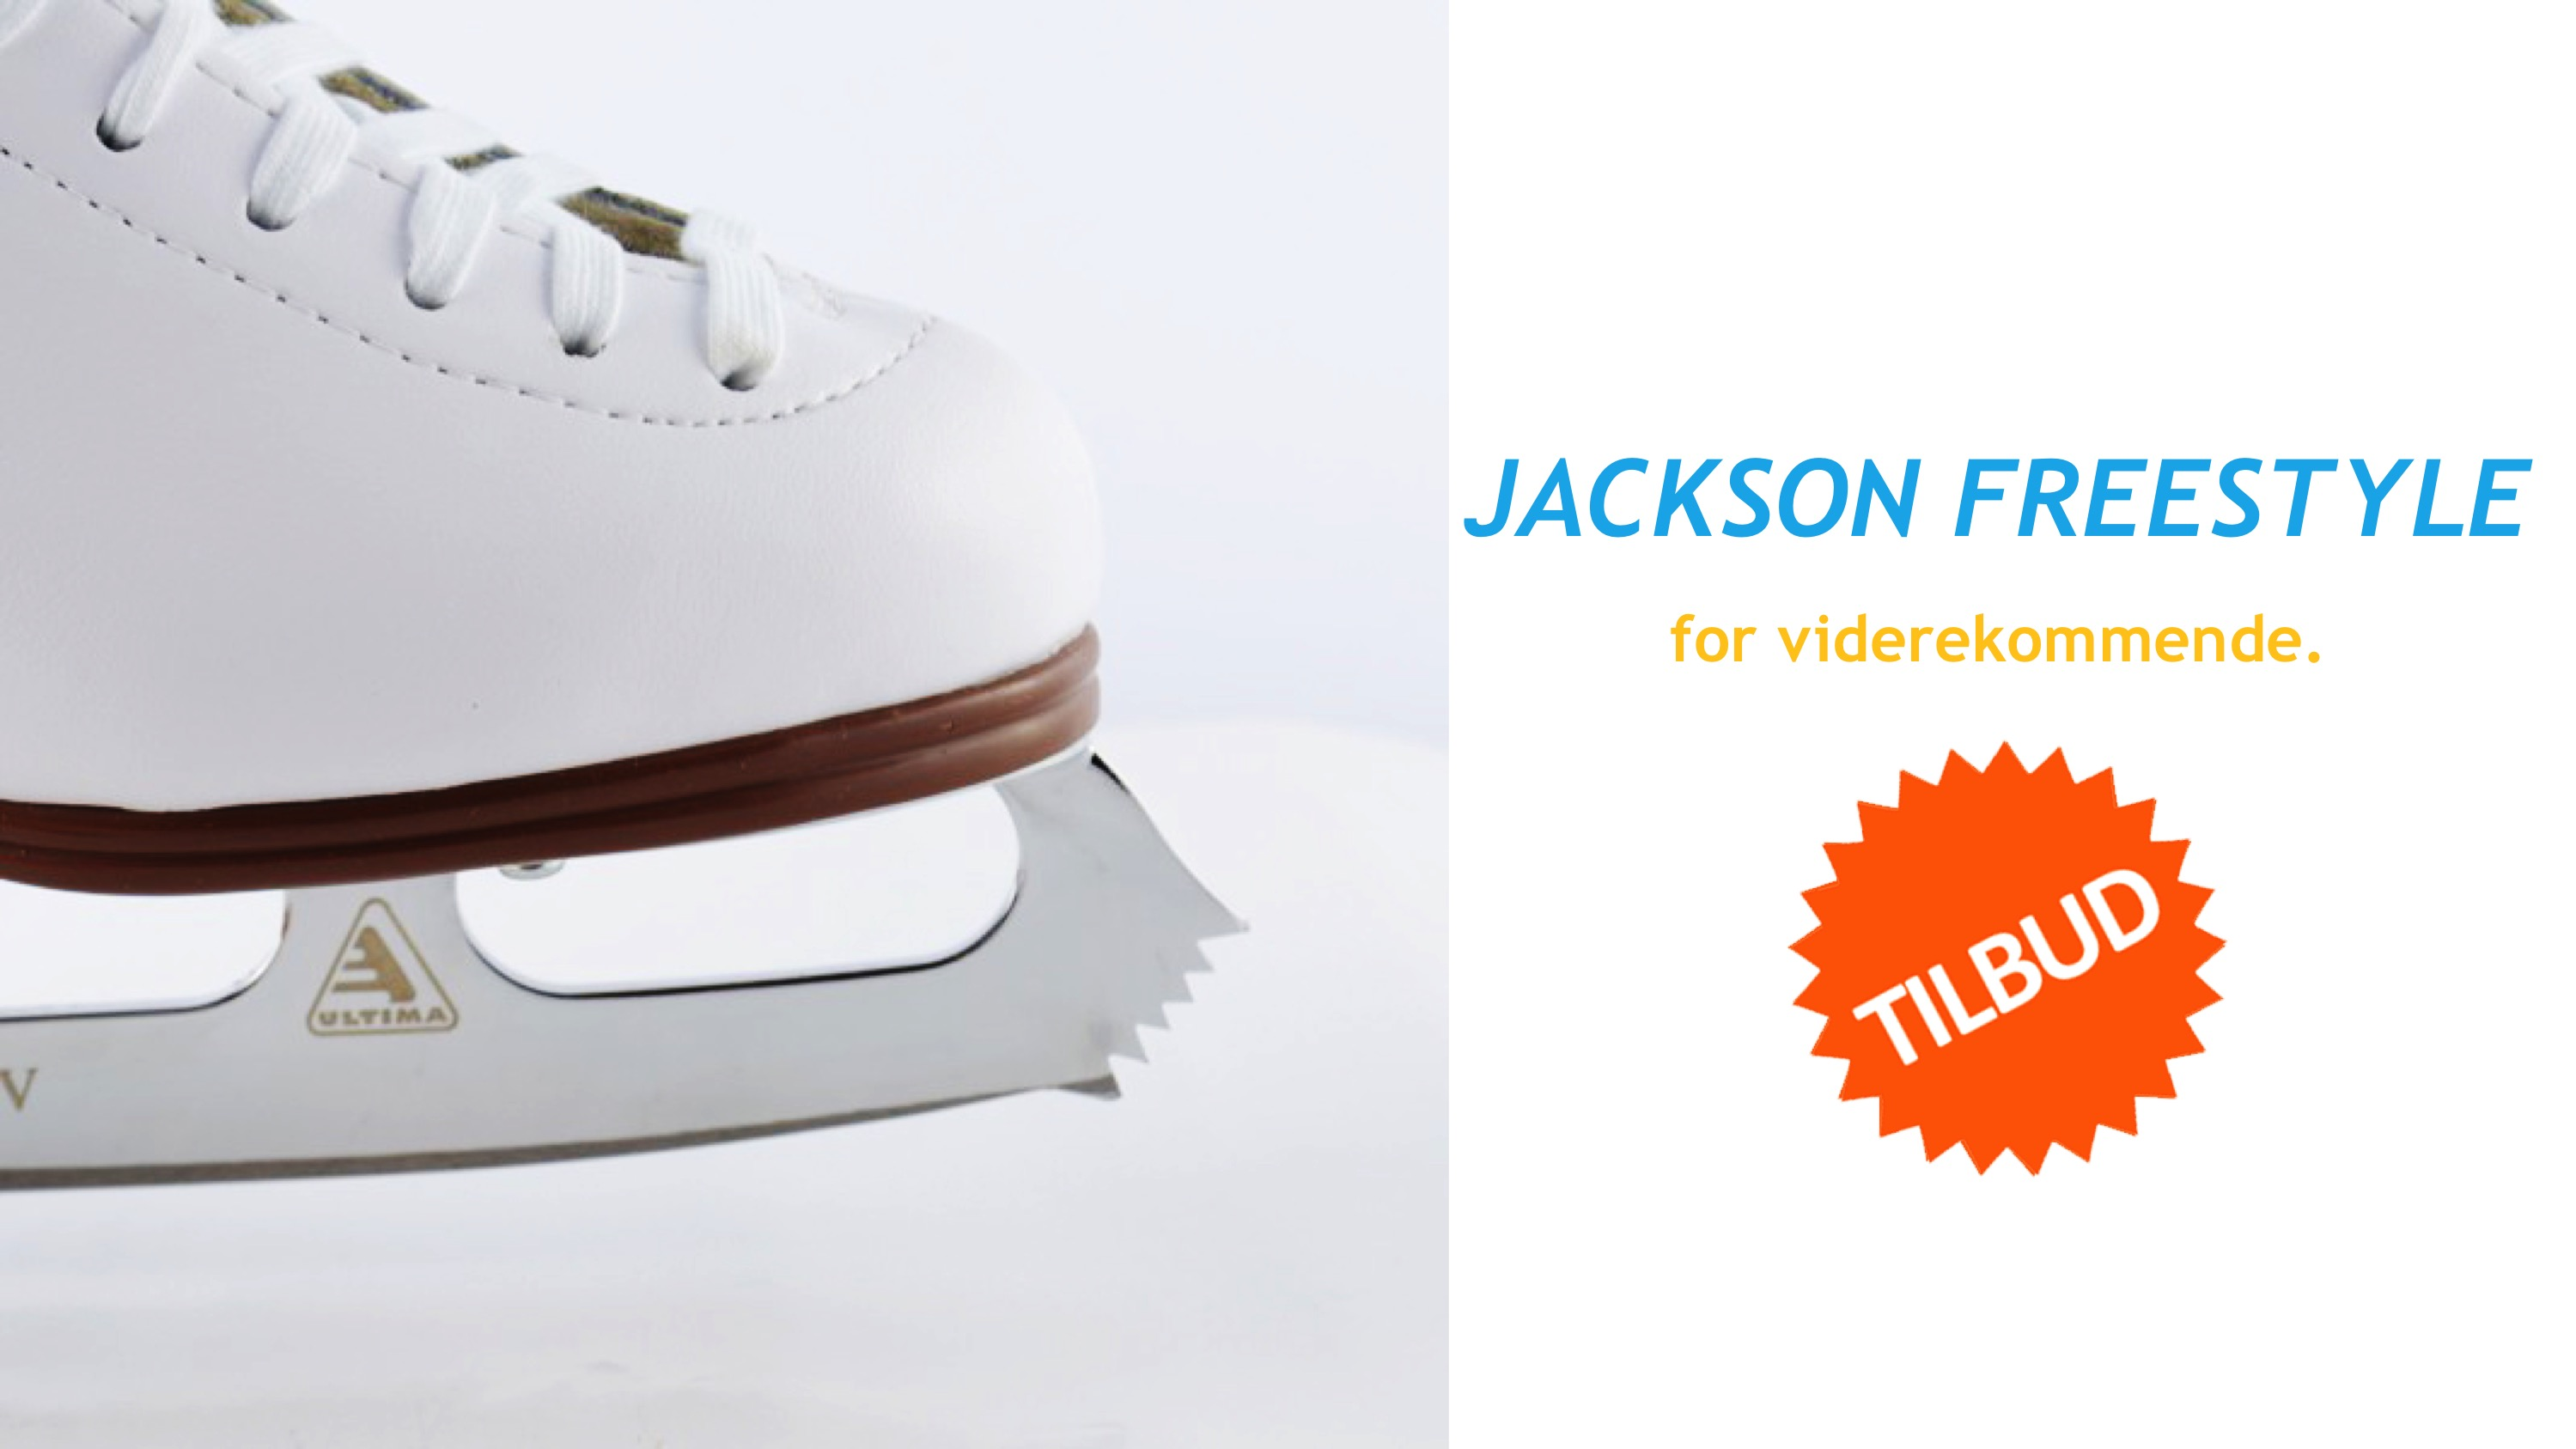 Jackson freestyle